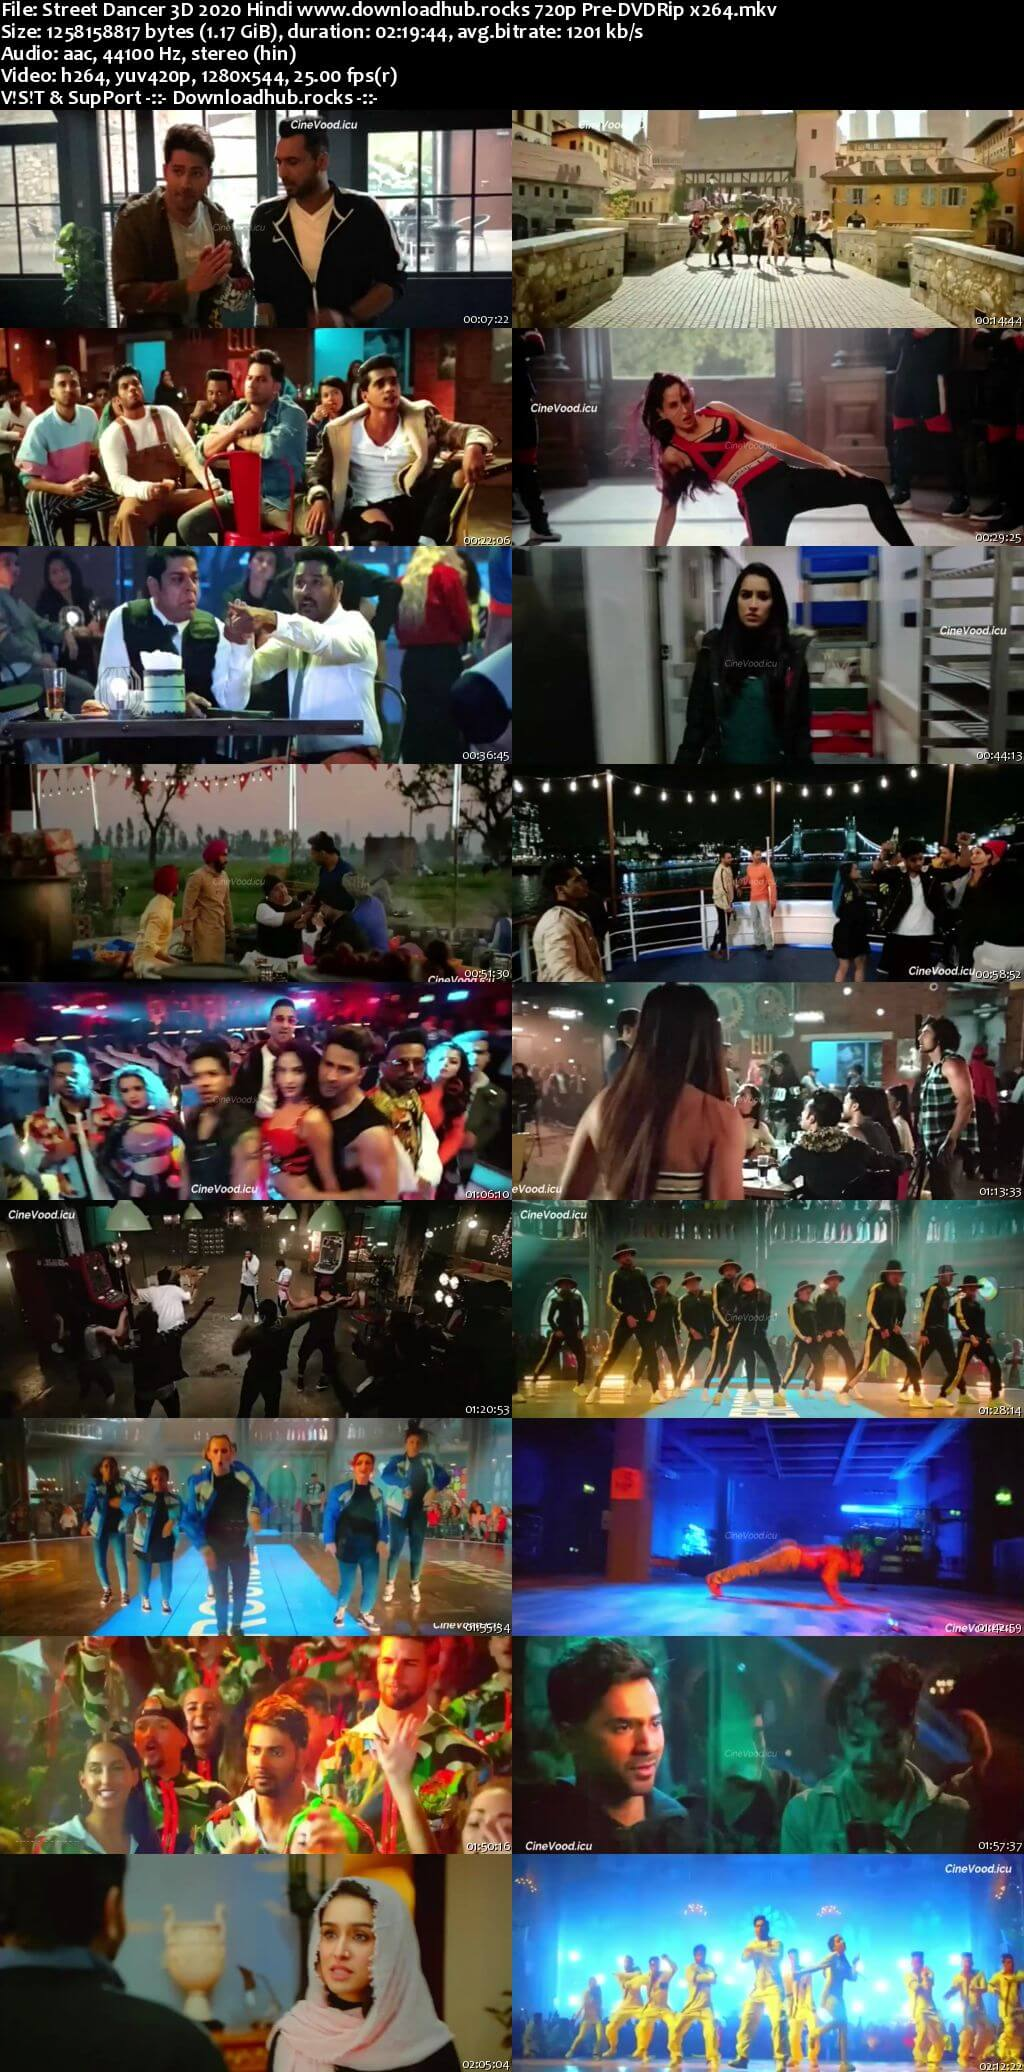 Street Dancer 3D 2020 Hindi 720p 480p Pre-DVDRip x264